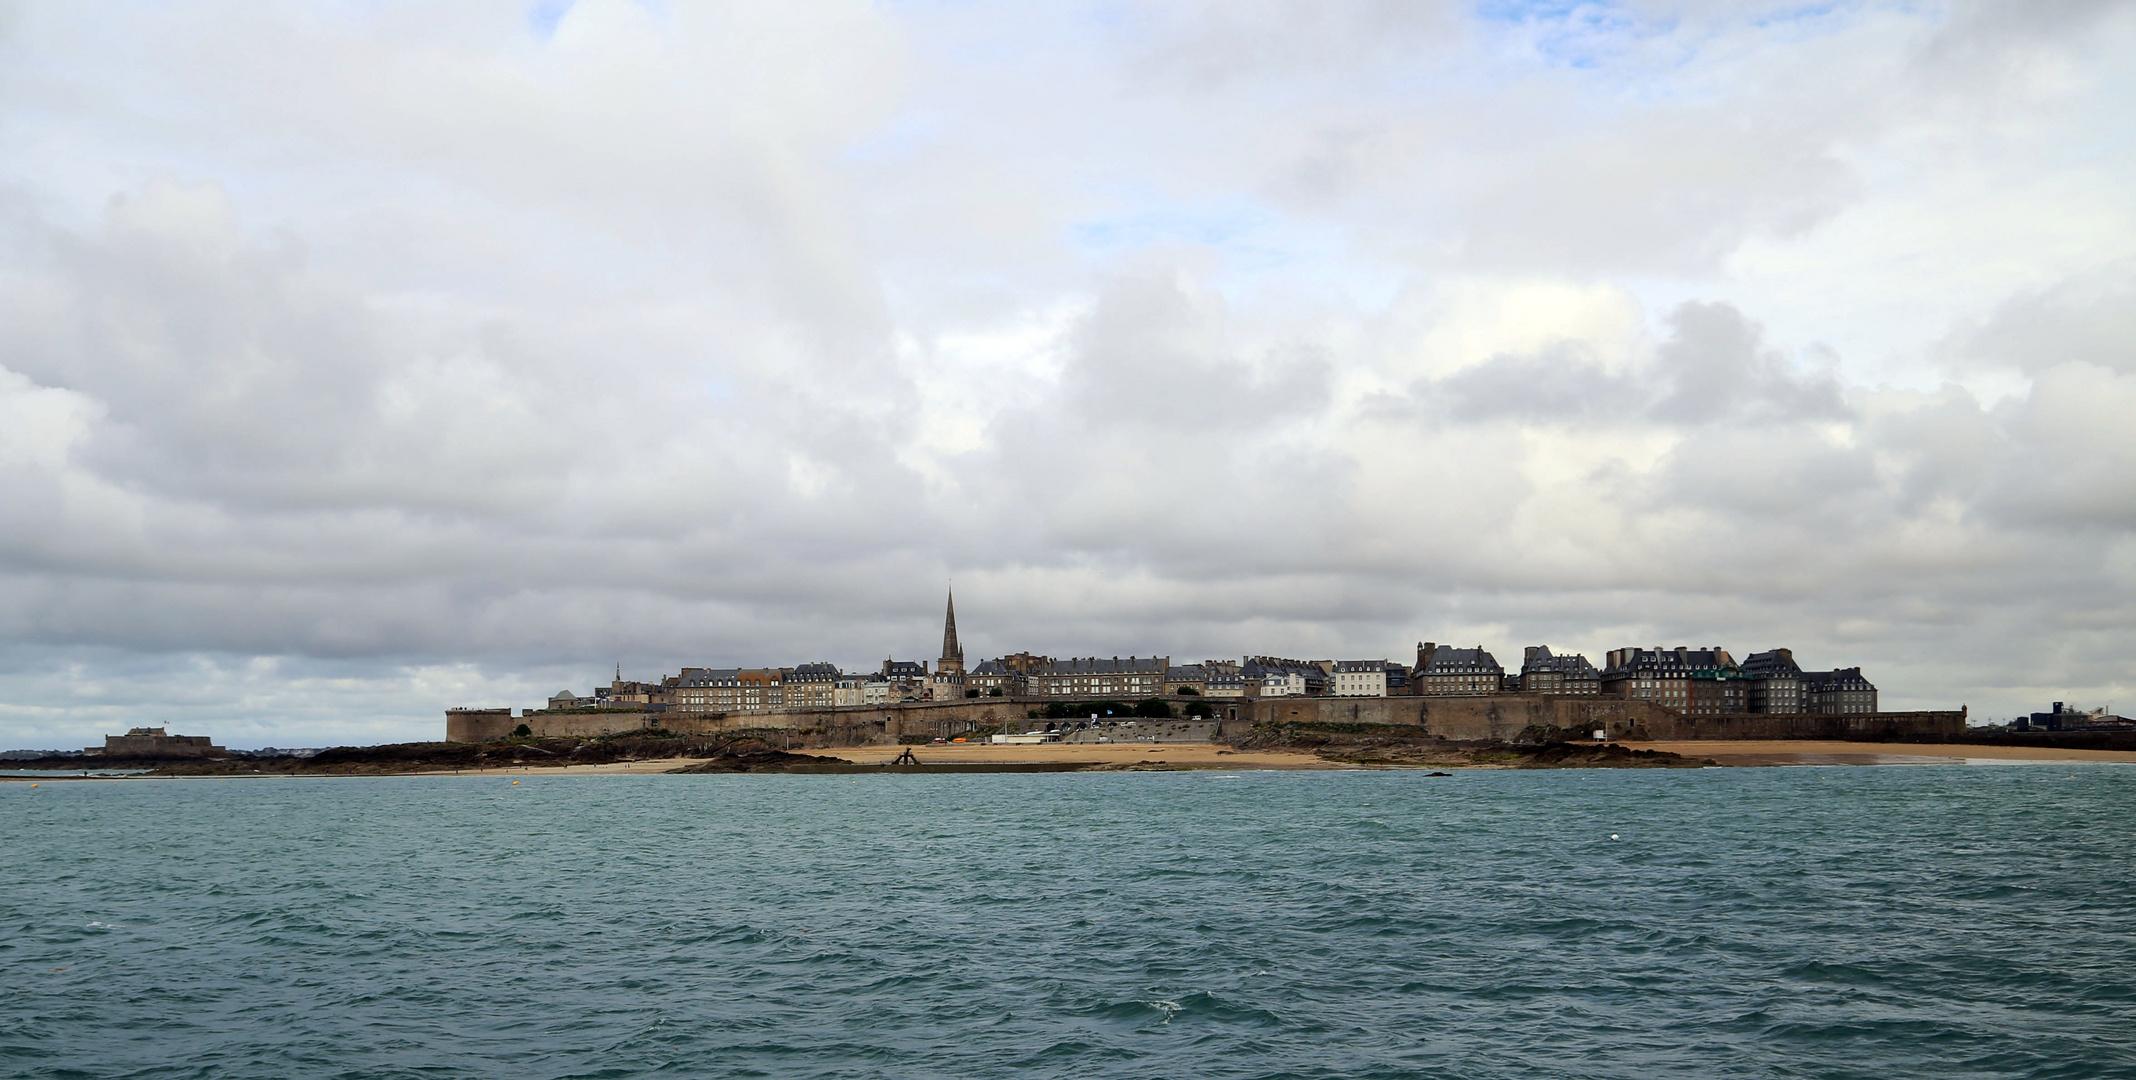 St Malo vue de la mer